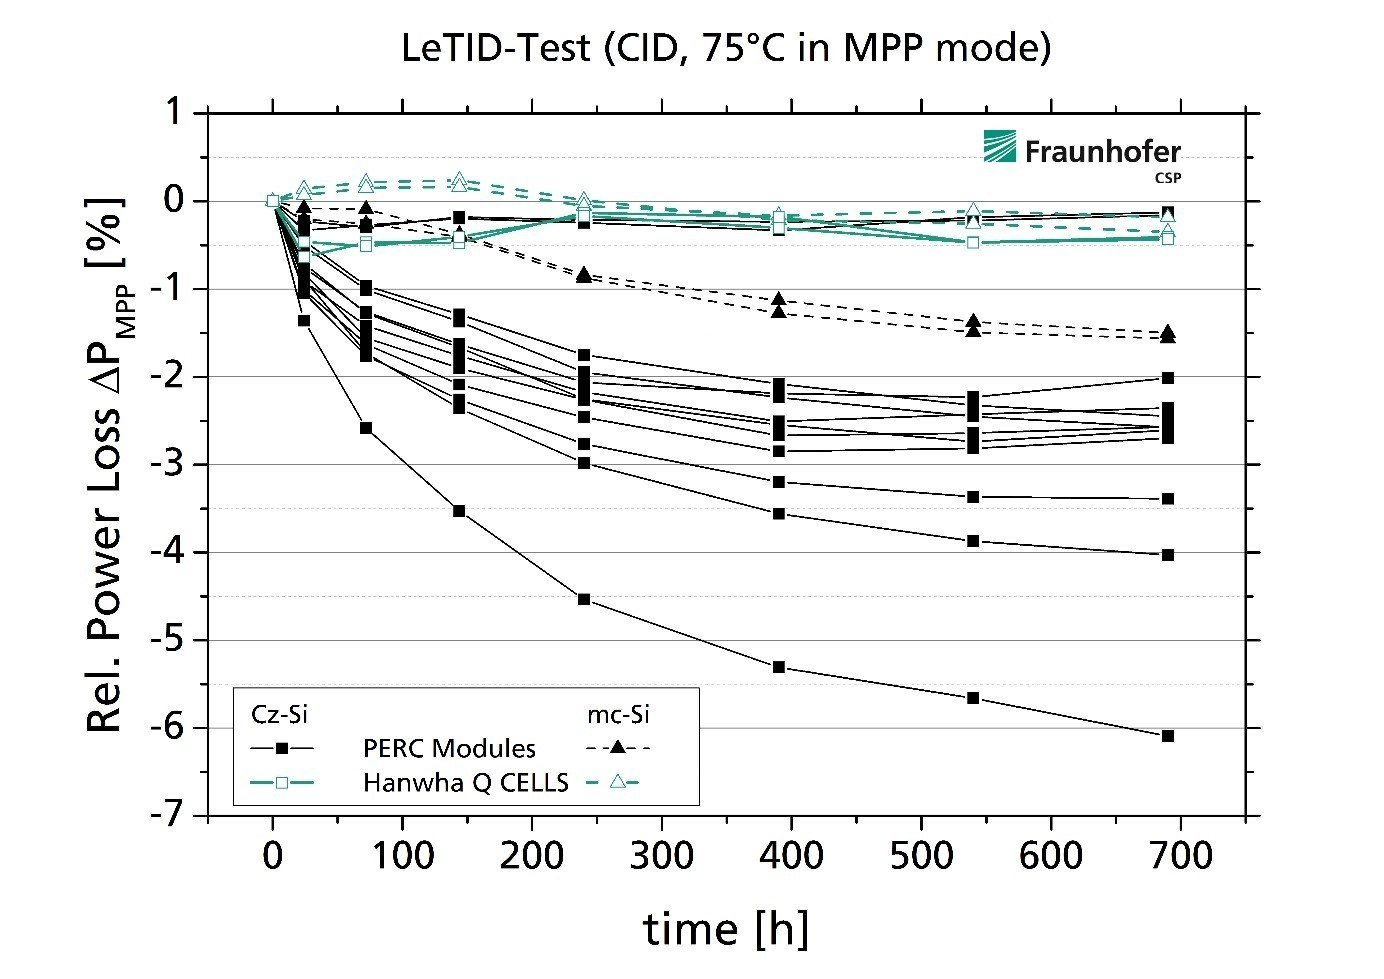 Fraunhofer CSP PERC LeTID Degradation results